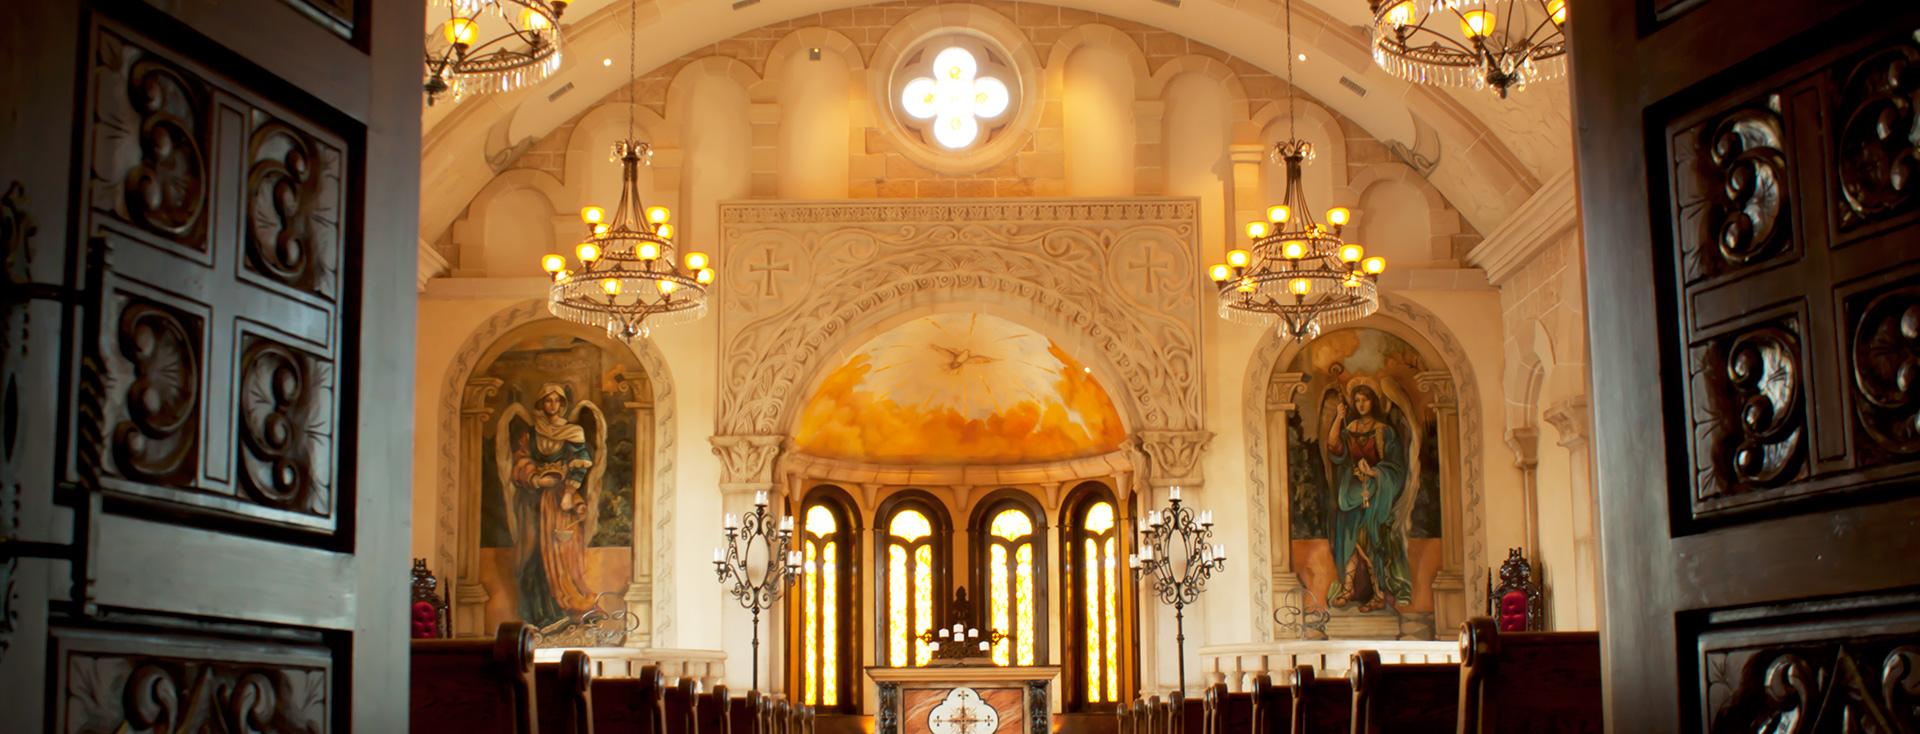 Chapel-detail-2.jpg